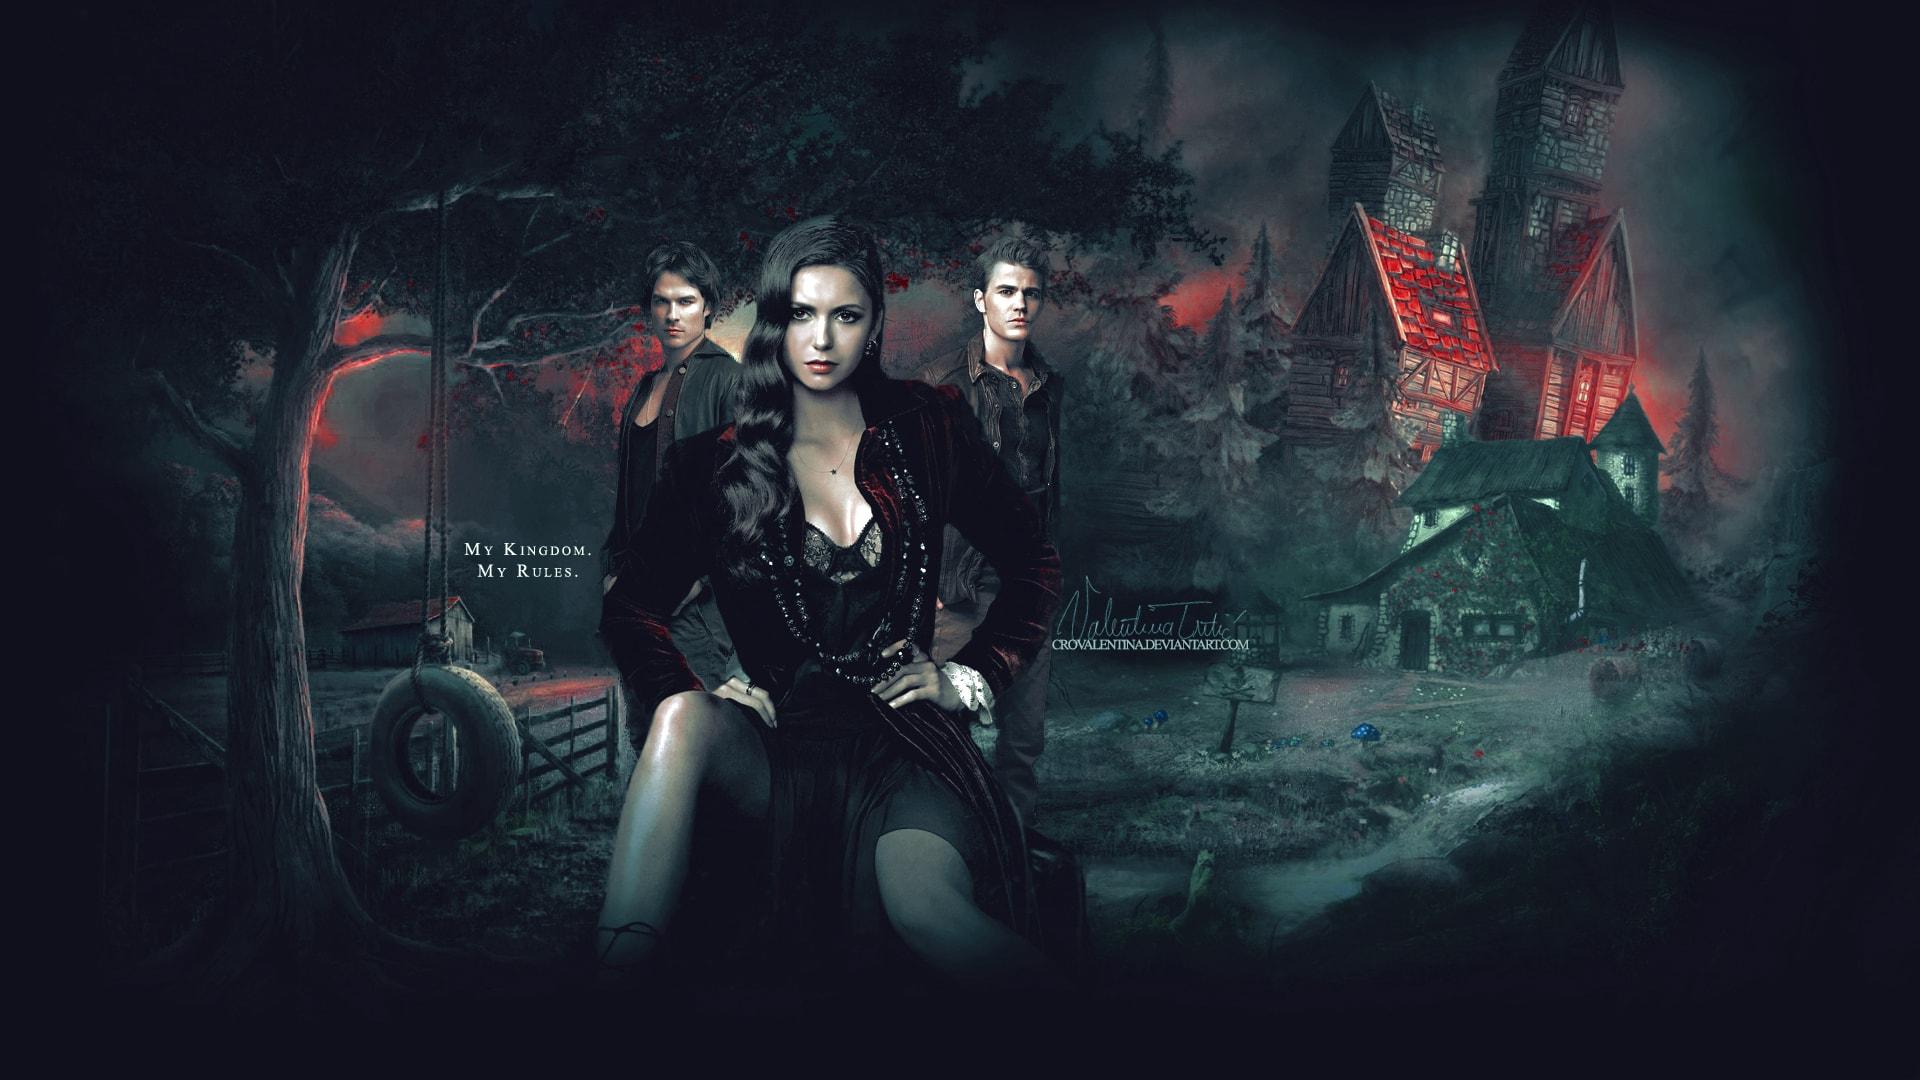 The Vampire Diaries Hd Wallpapers 7wallpapers Net